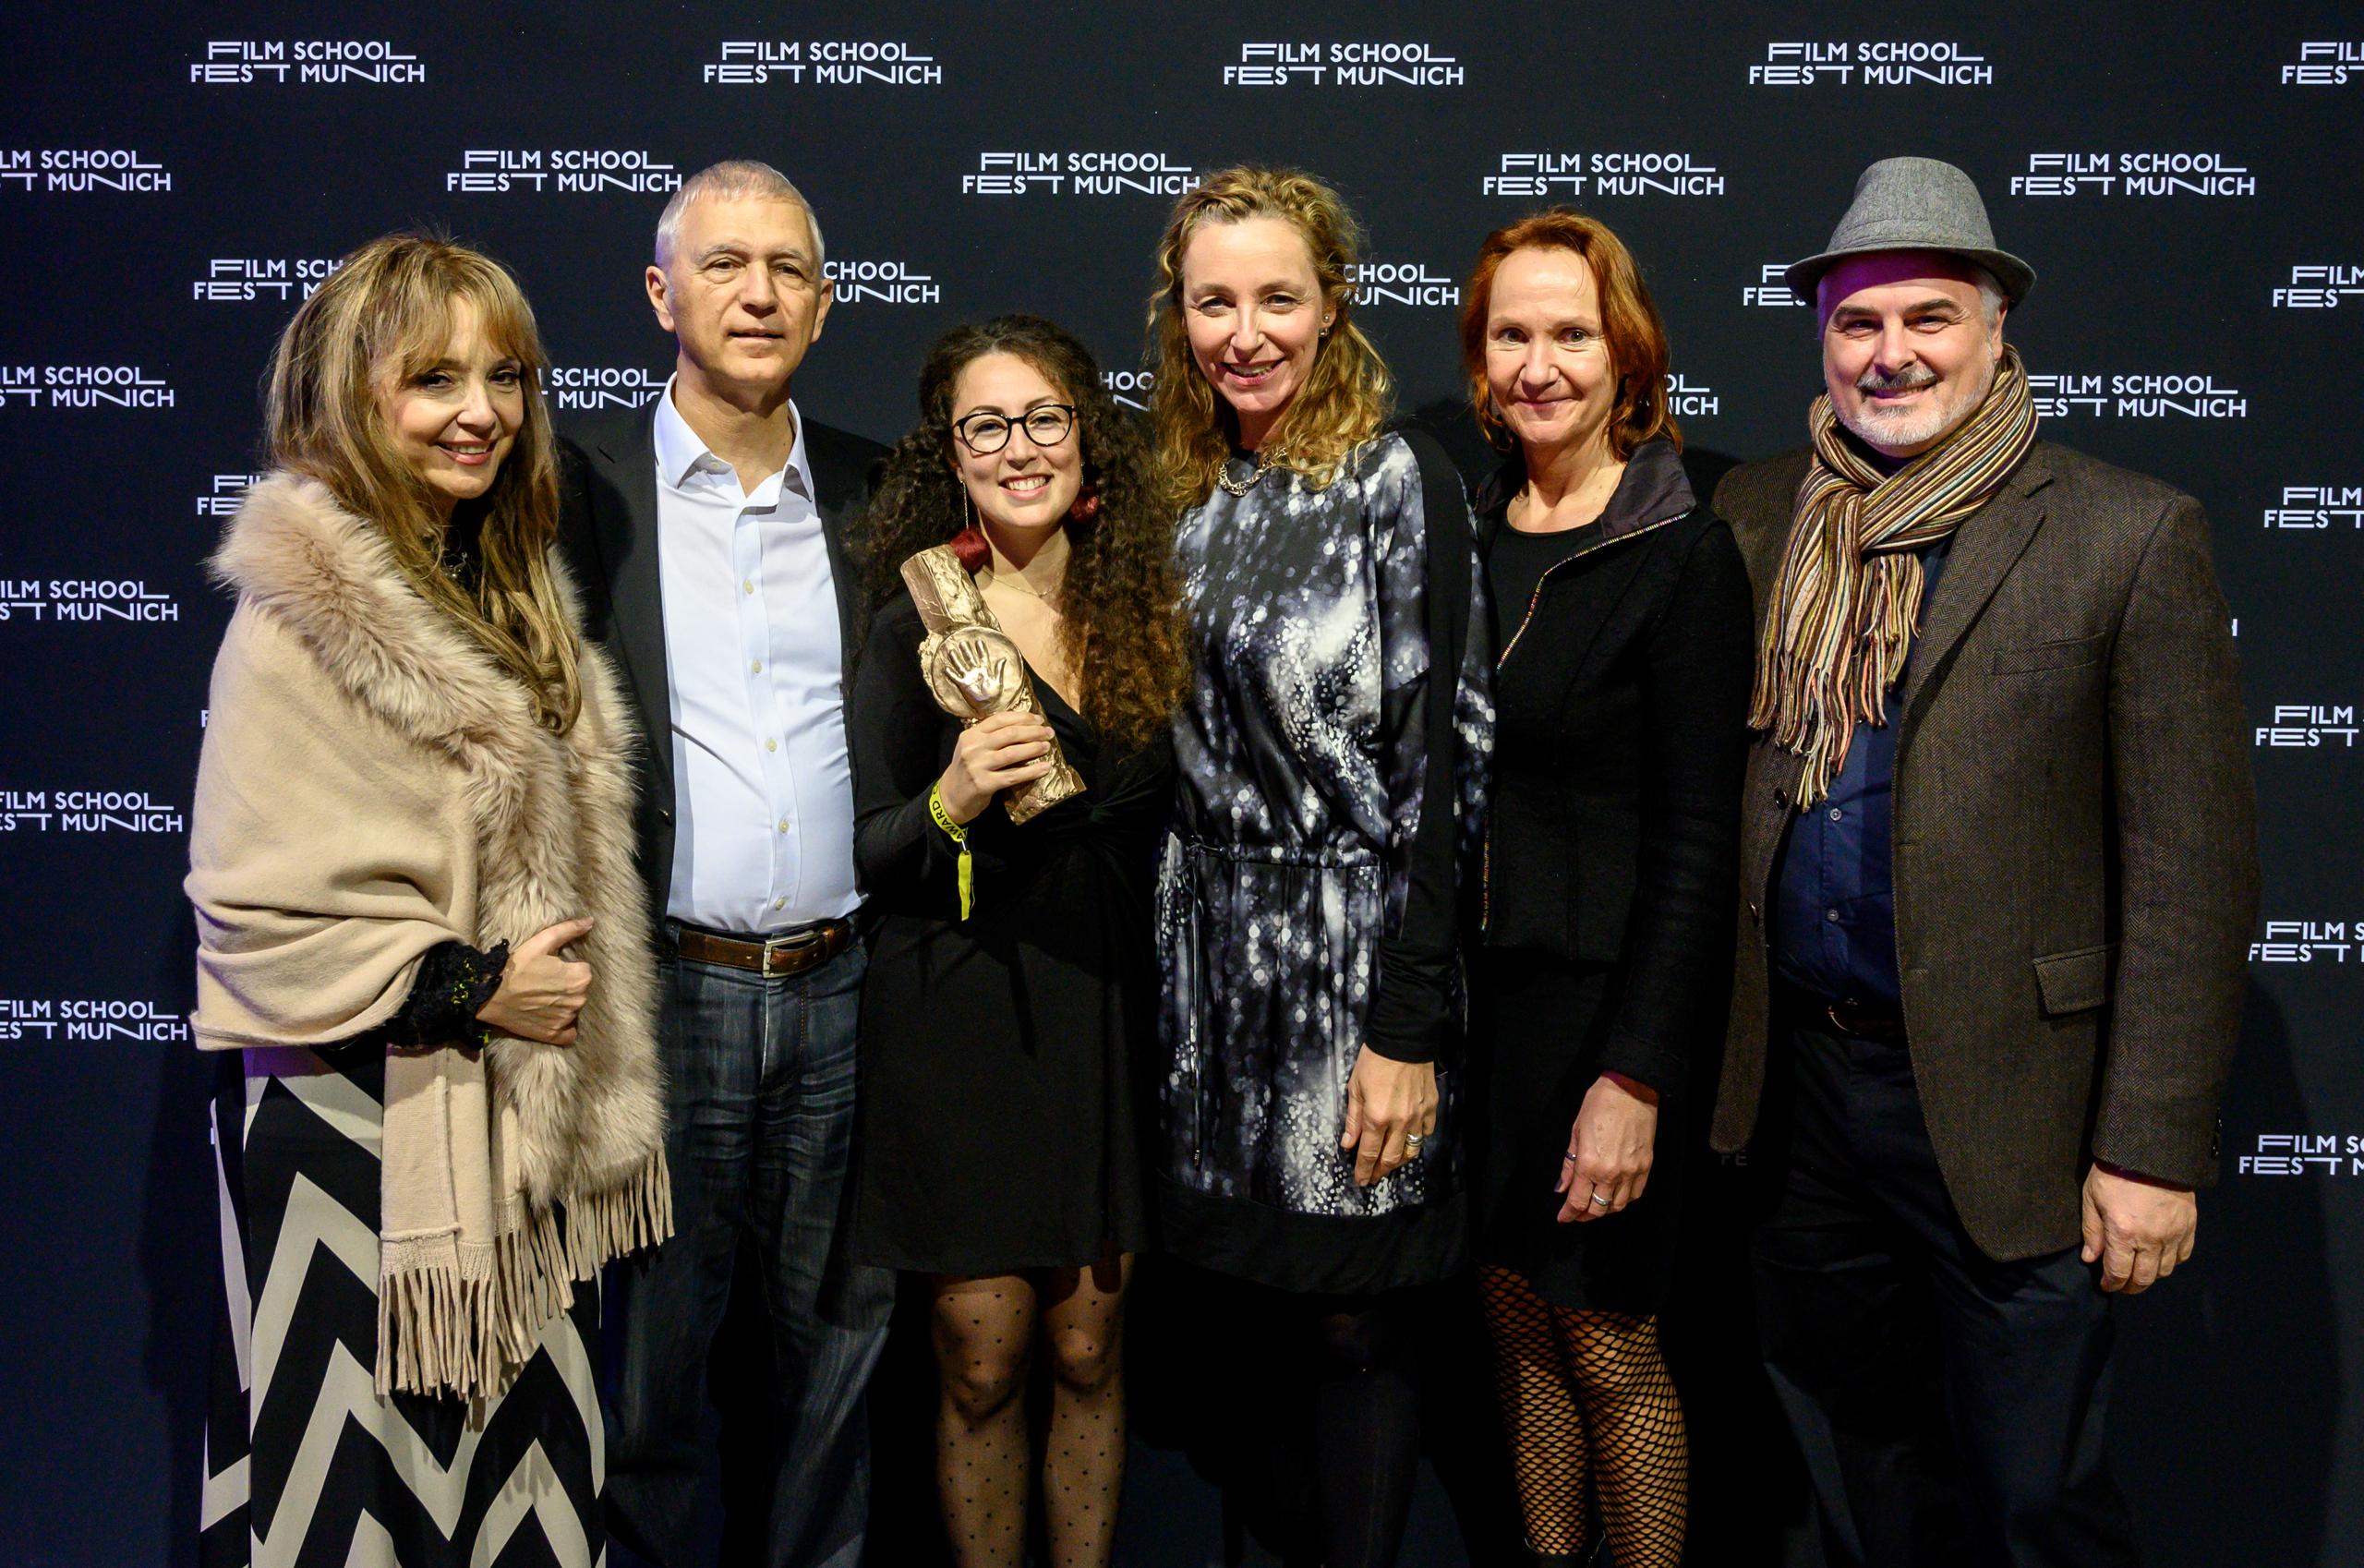 Prix Interculturel 2019 - Preisverleihung 2